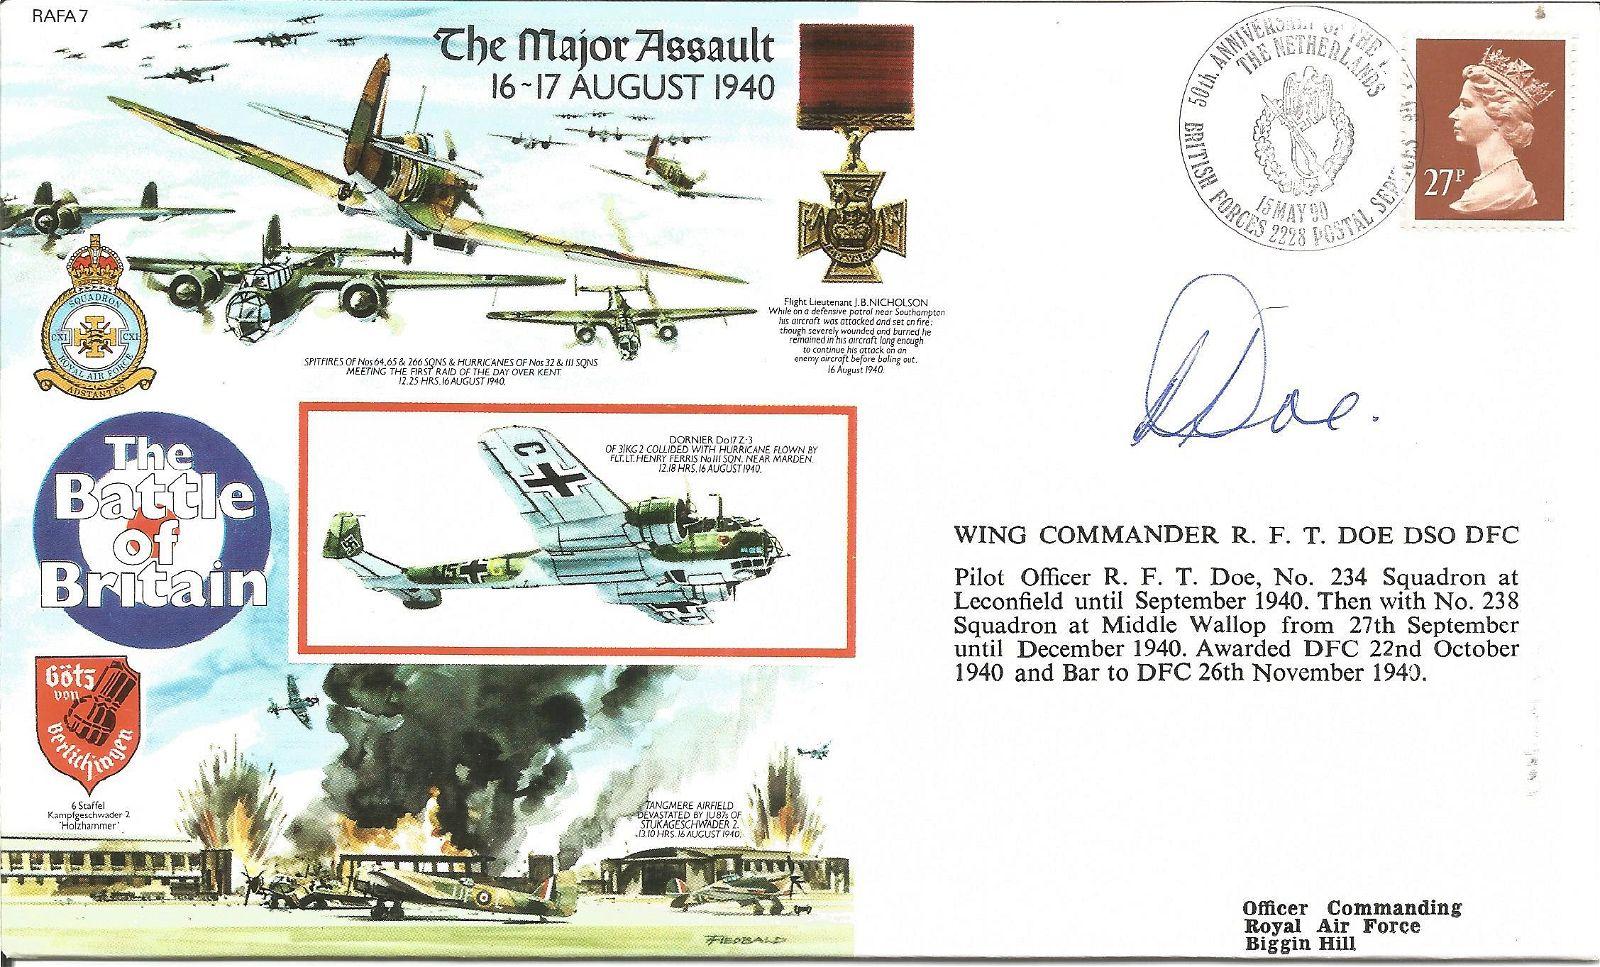 Wg Cdr Bob Doe DSO DFC WW2 BOB pilot signed 1990, 50th